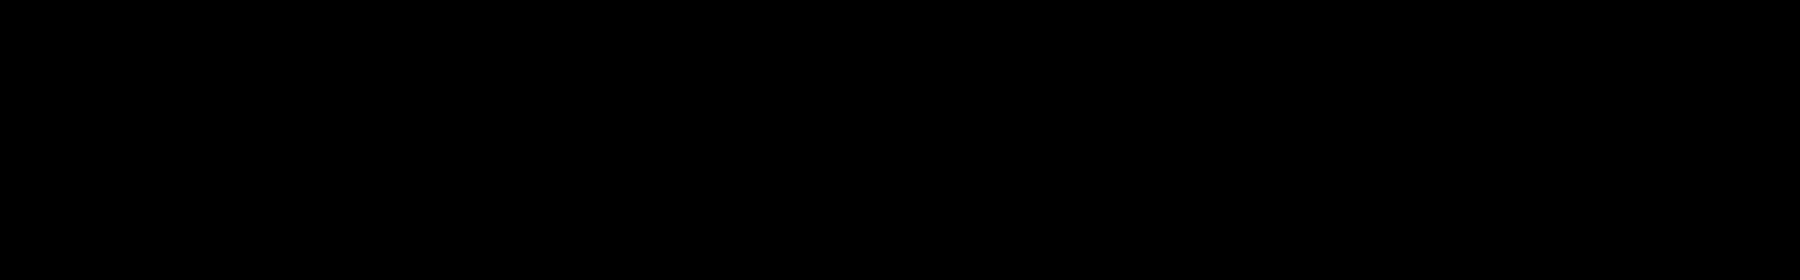 Premier DnB Loops audio waveform